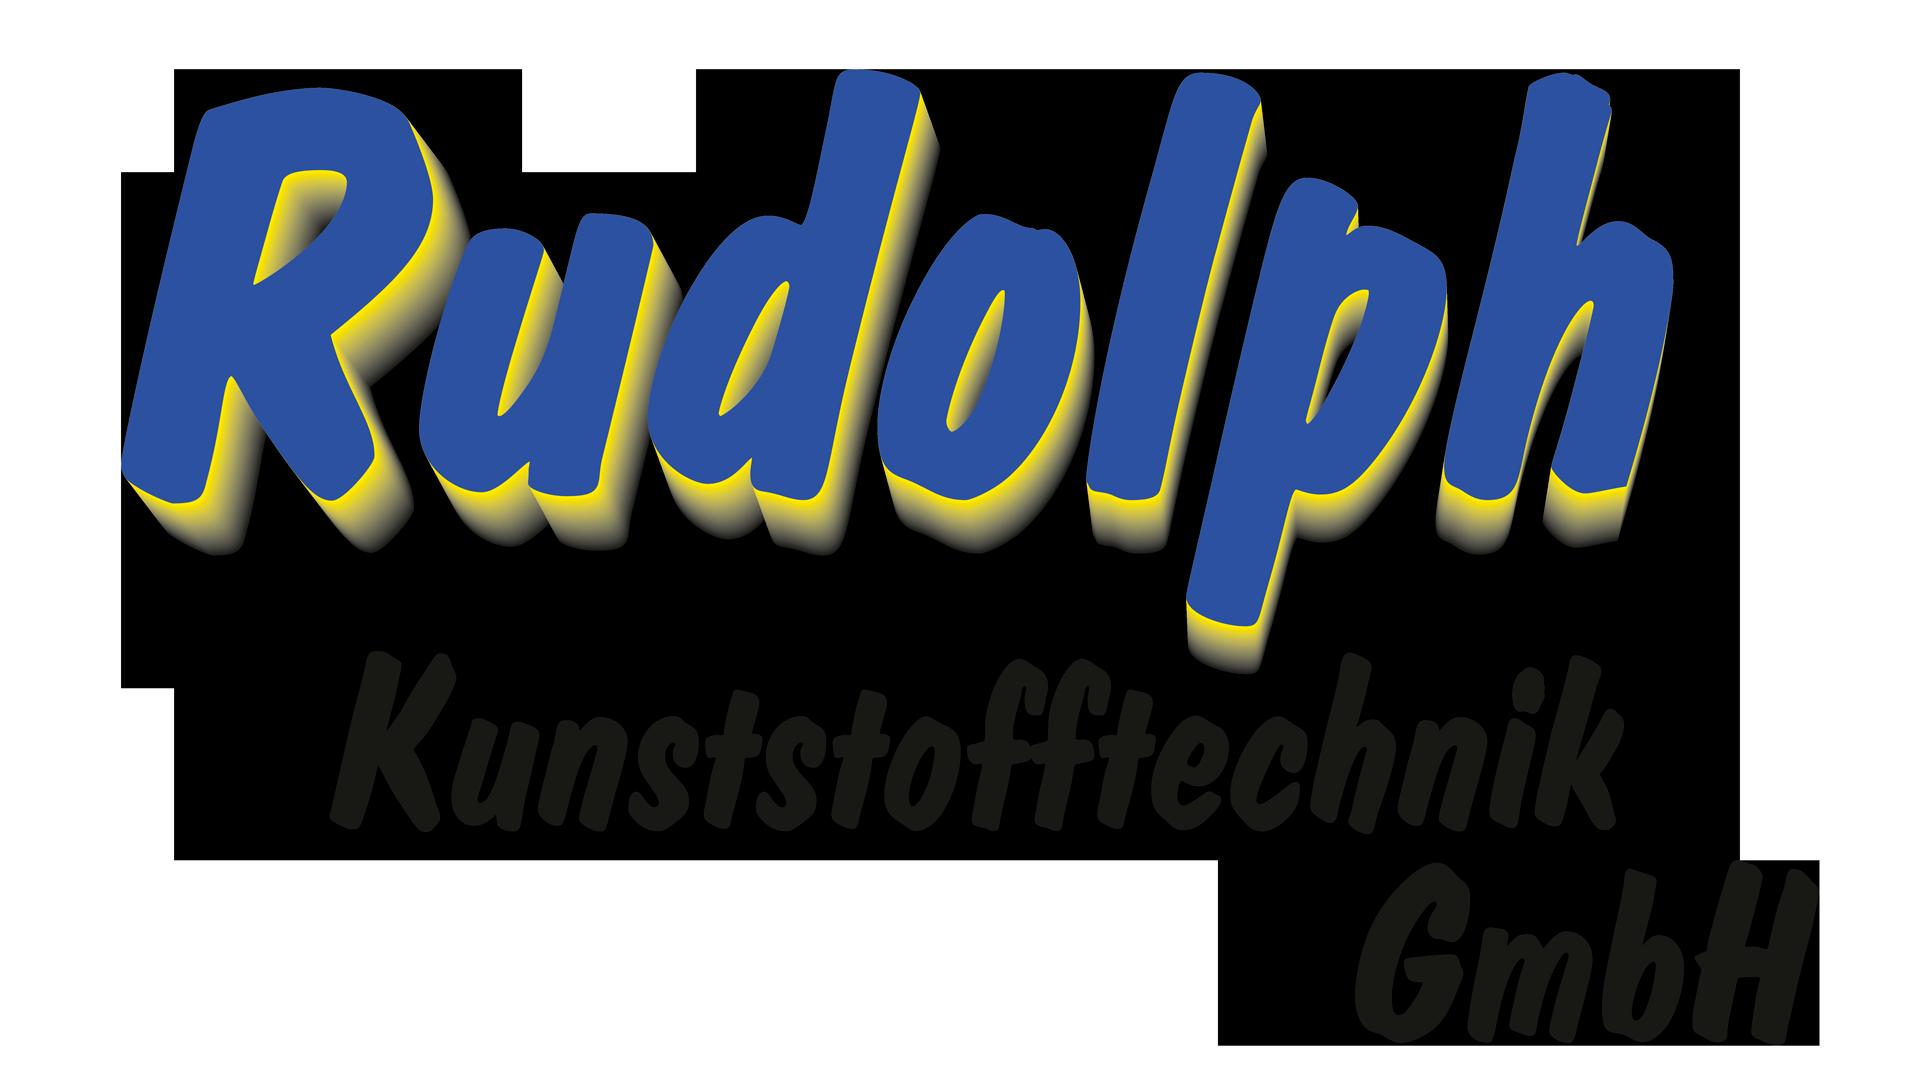 Rudolph Kunststofftechnik Logo